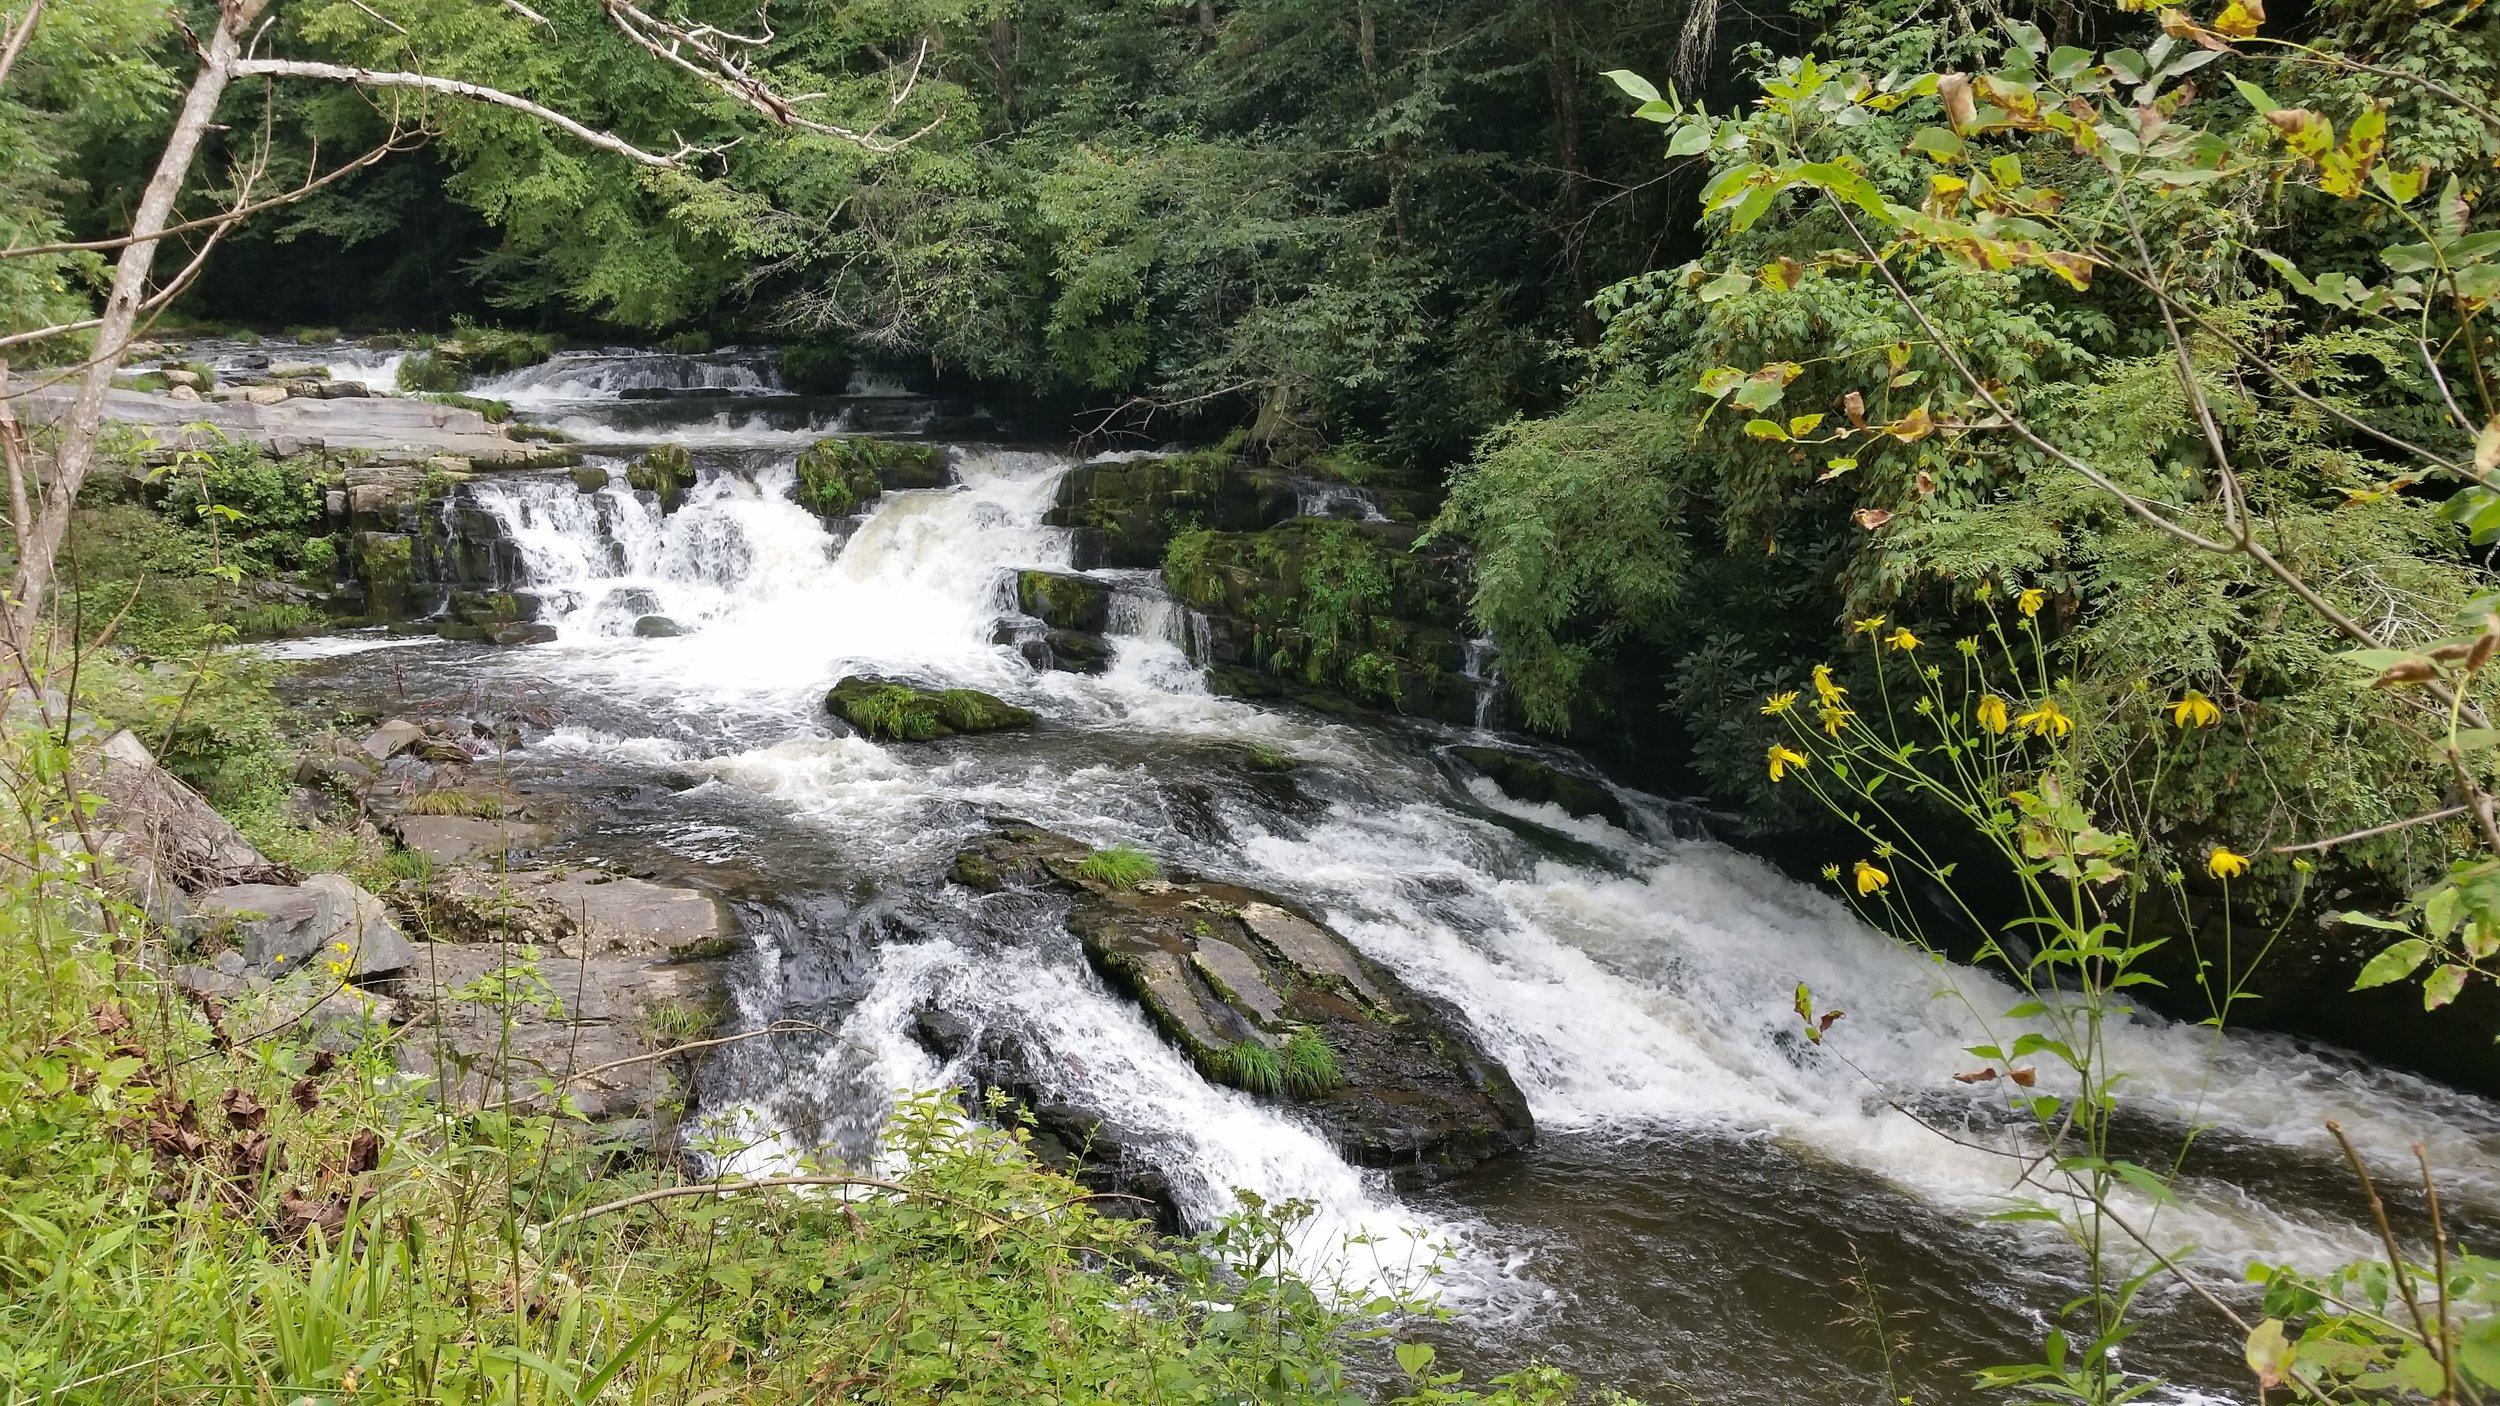 noc waterfall.jpg